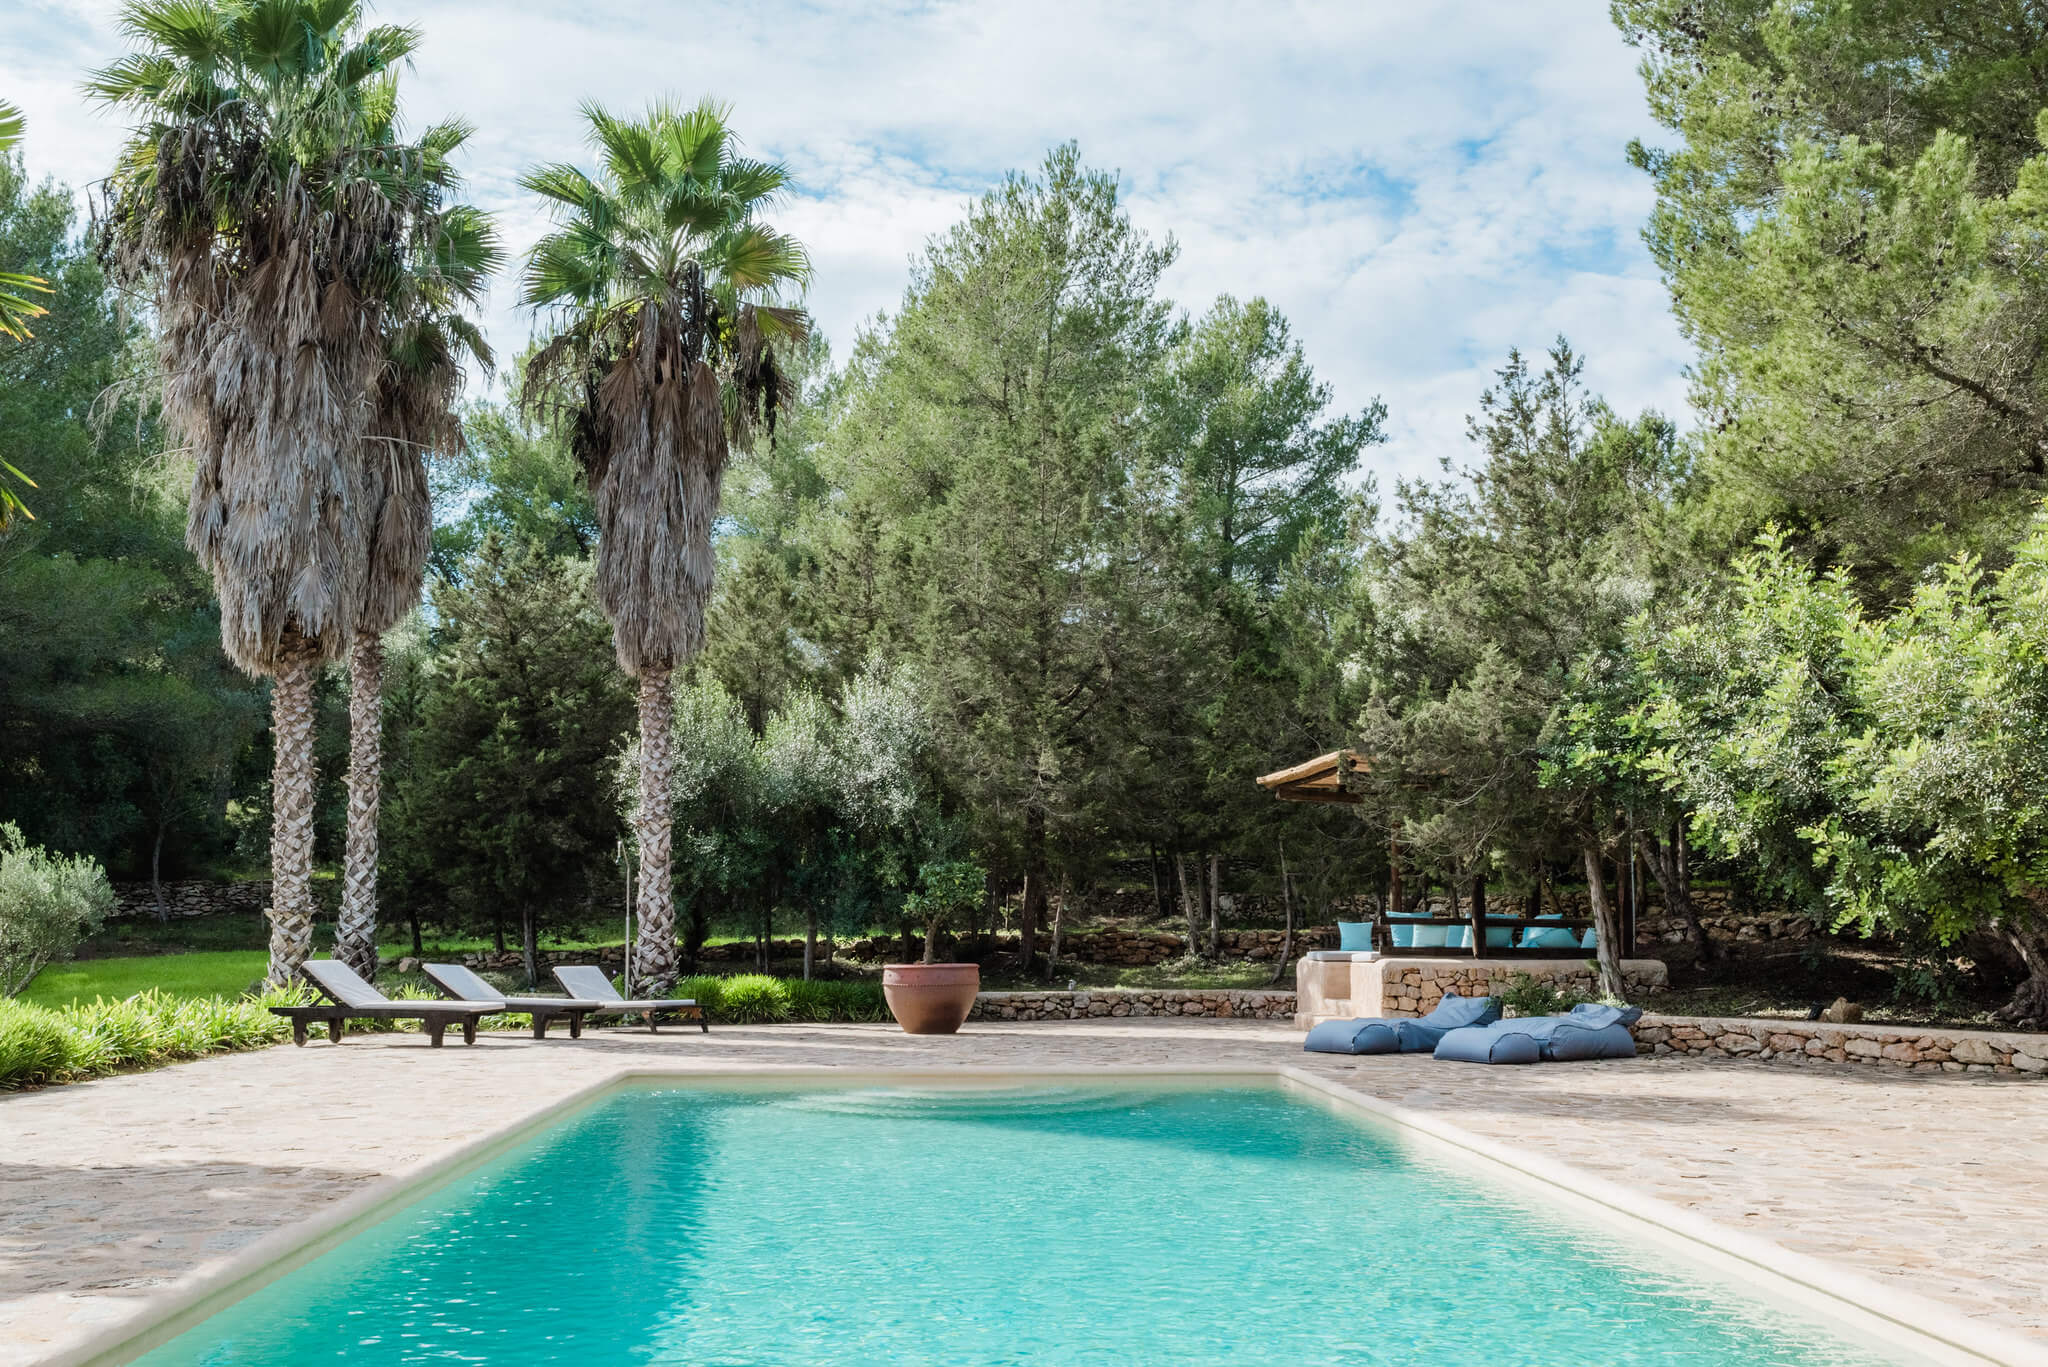 https://www.white-ibiza.com/wp-content/uploads/2020/05/white-ibiza-villas-can-sabina-exterior-pool.jpg